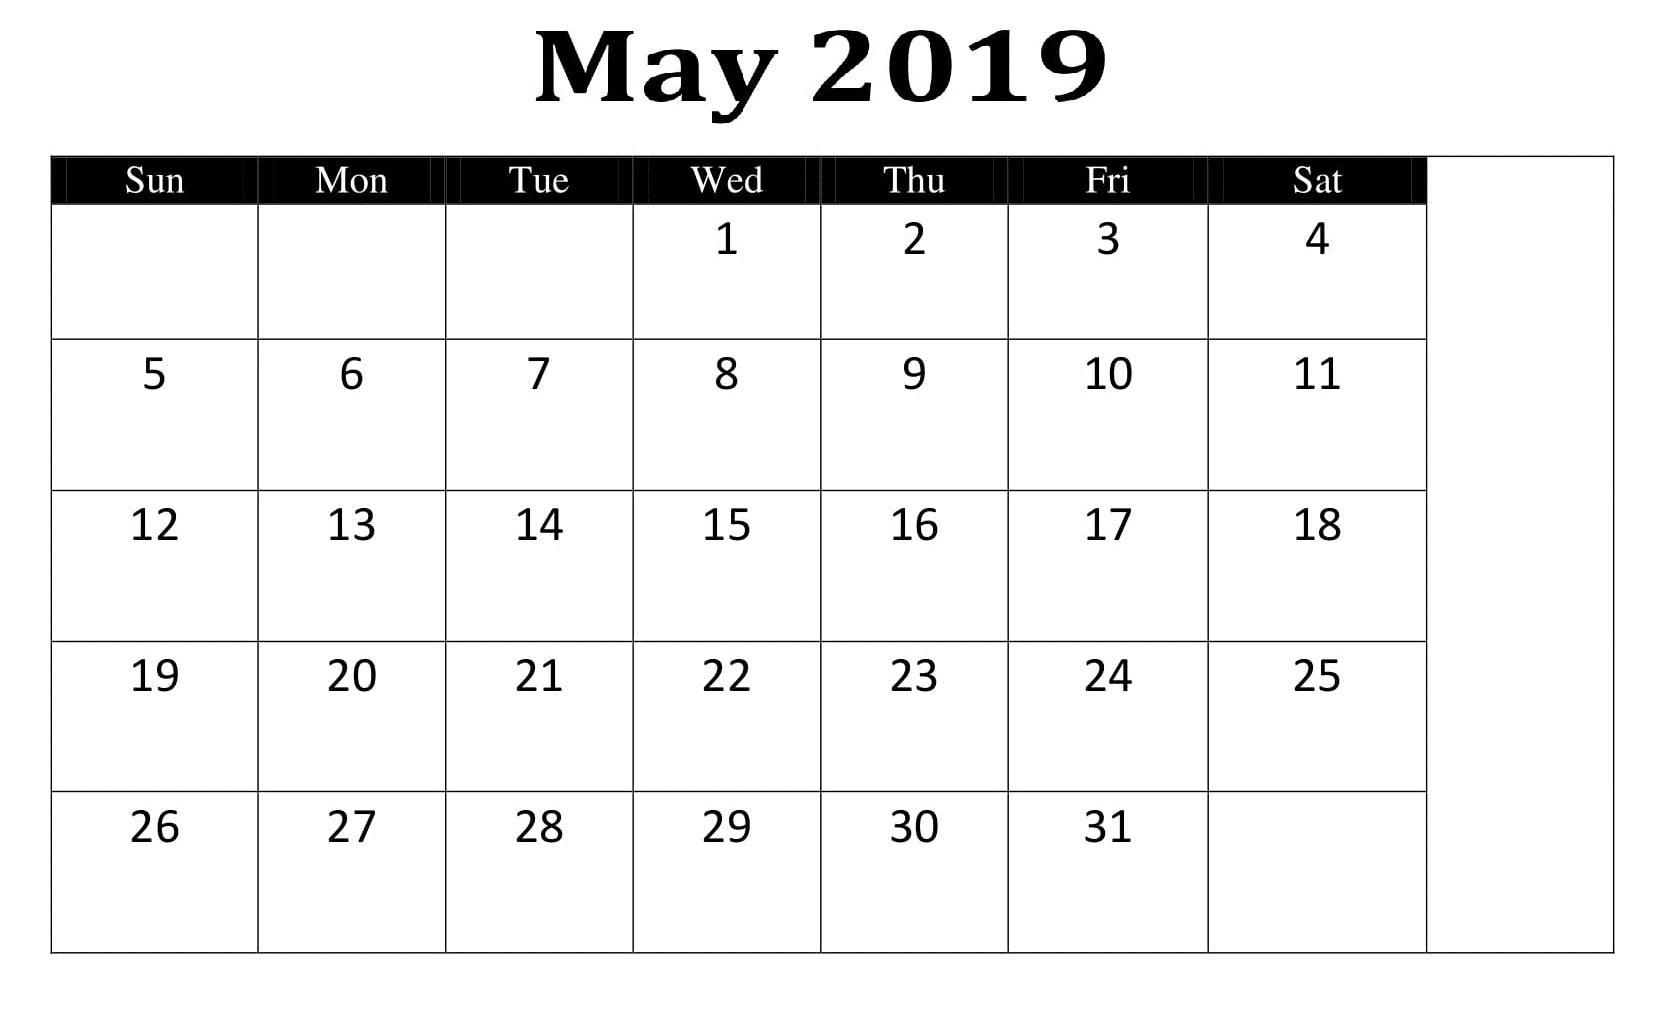 May 2019 Calendar Template Planner